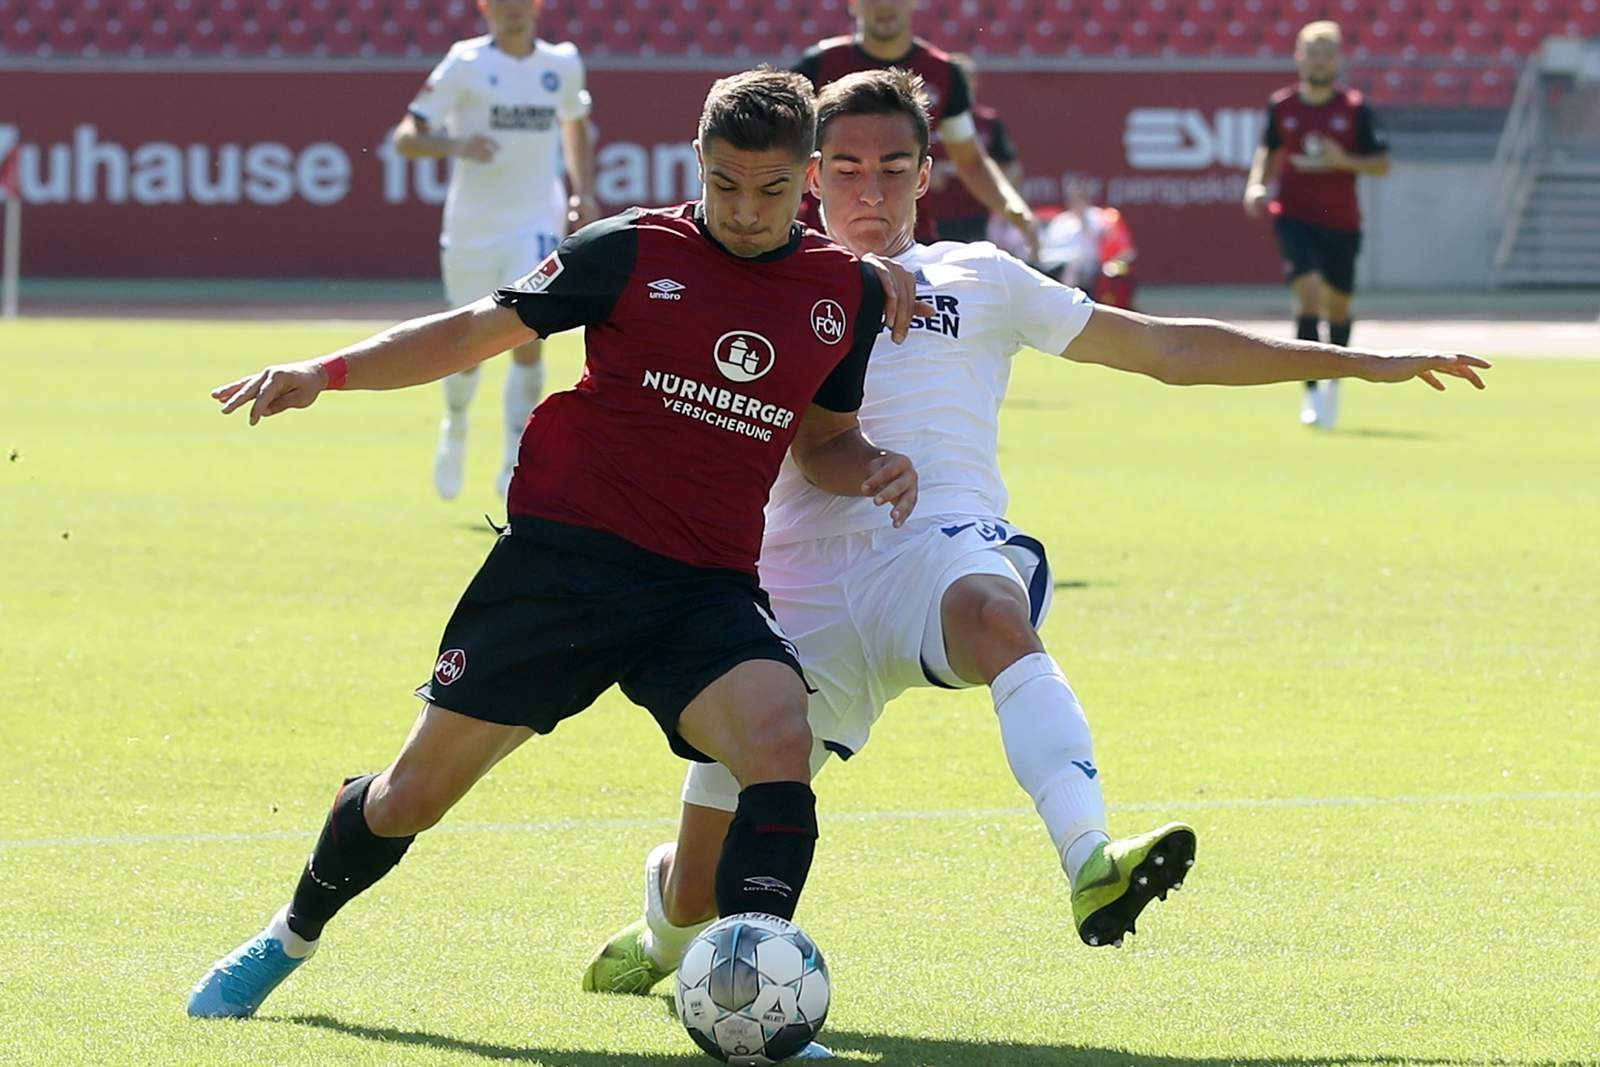 Nikola Dovedan vom 1. FC Nürnberg gegen Dirk Carlson vom KSC